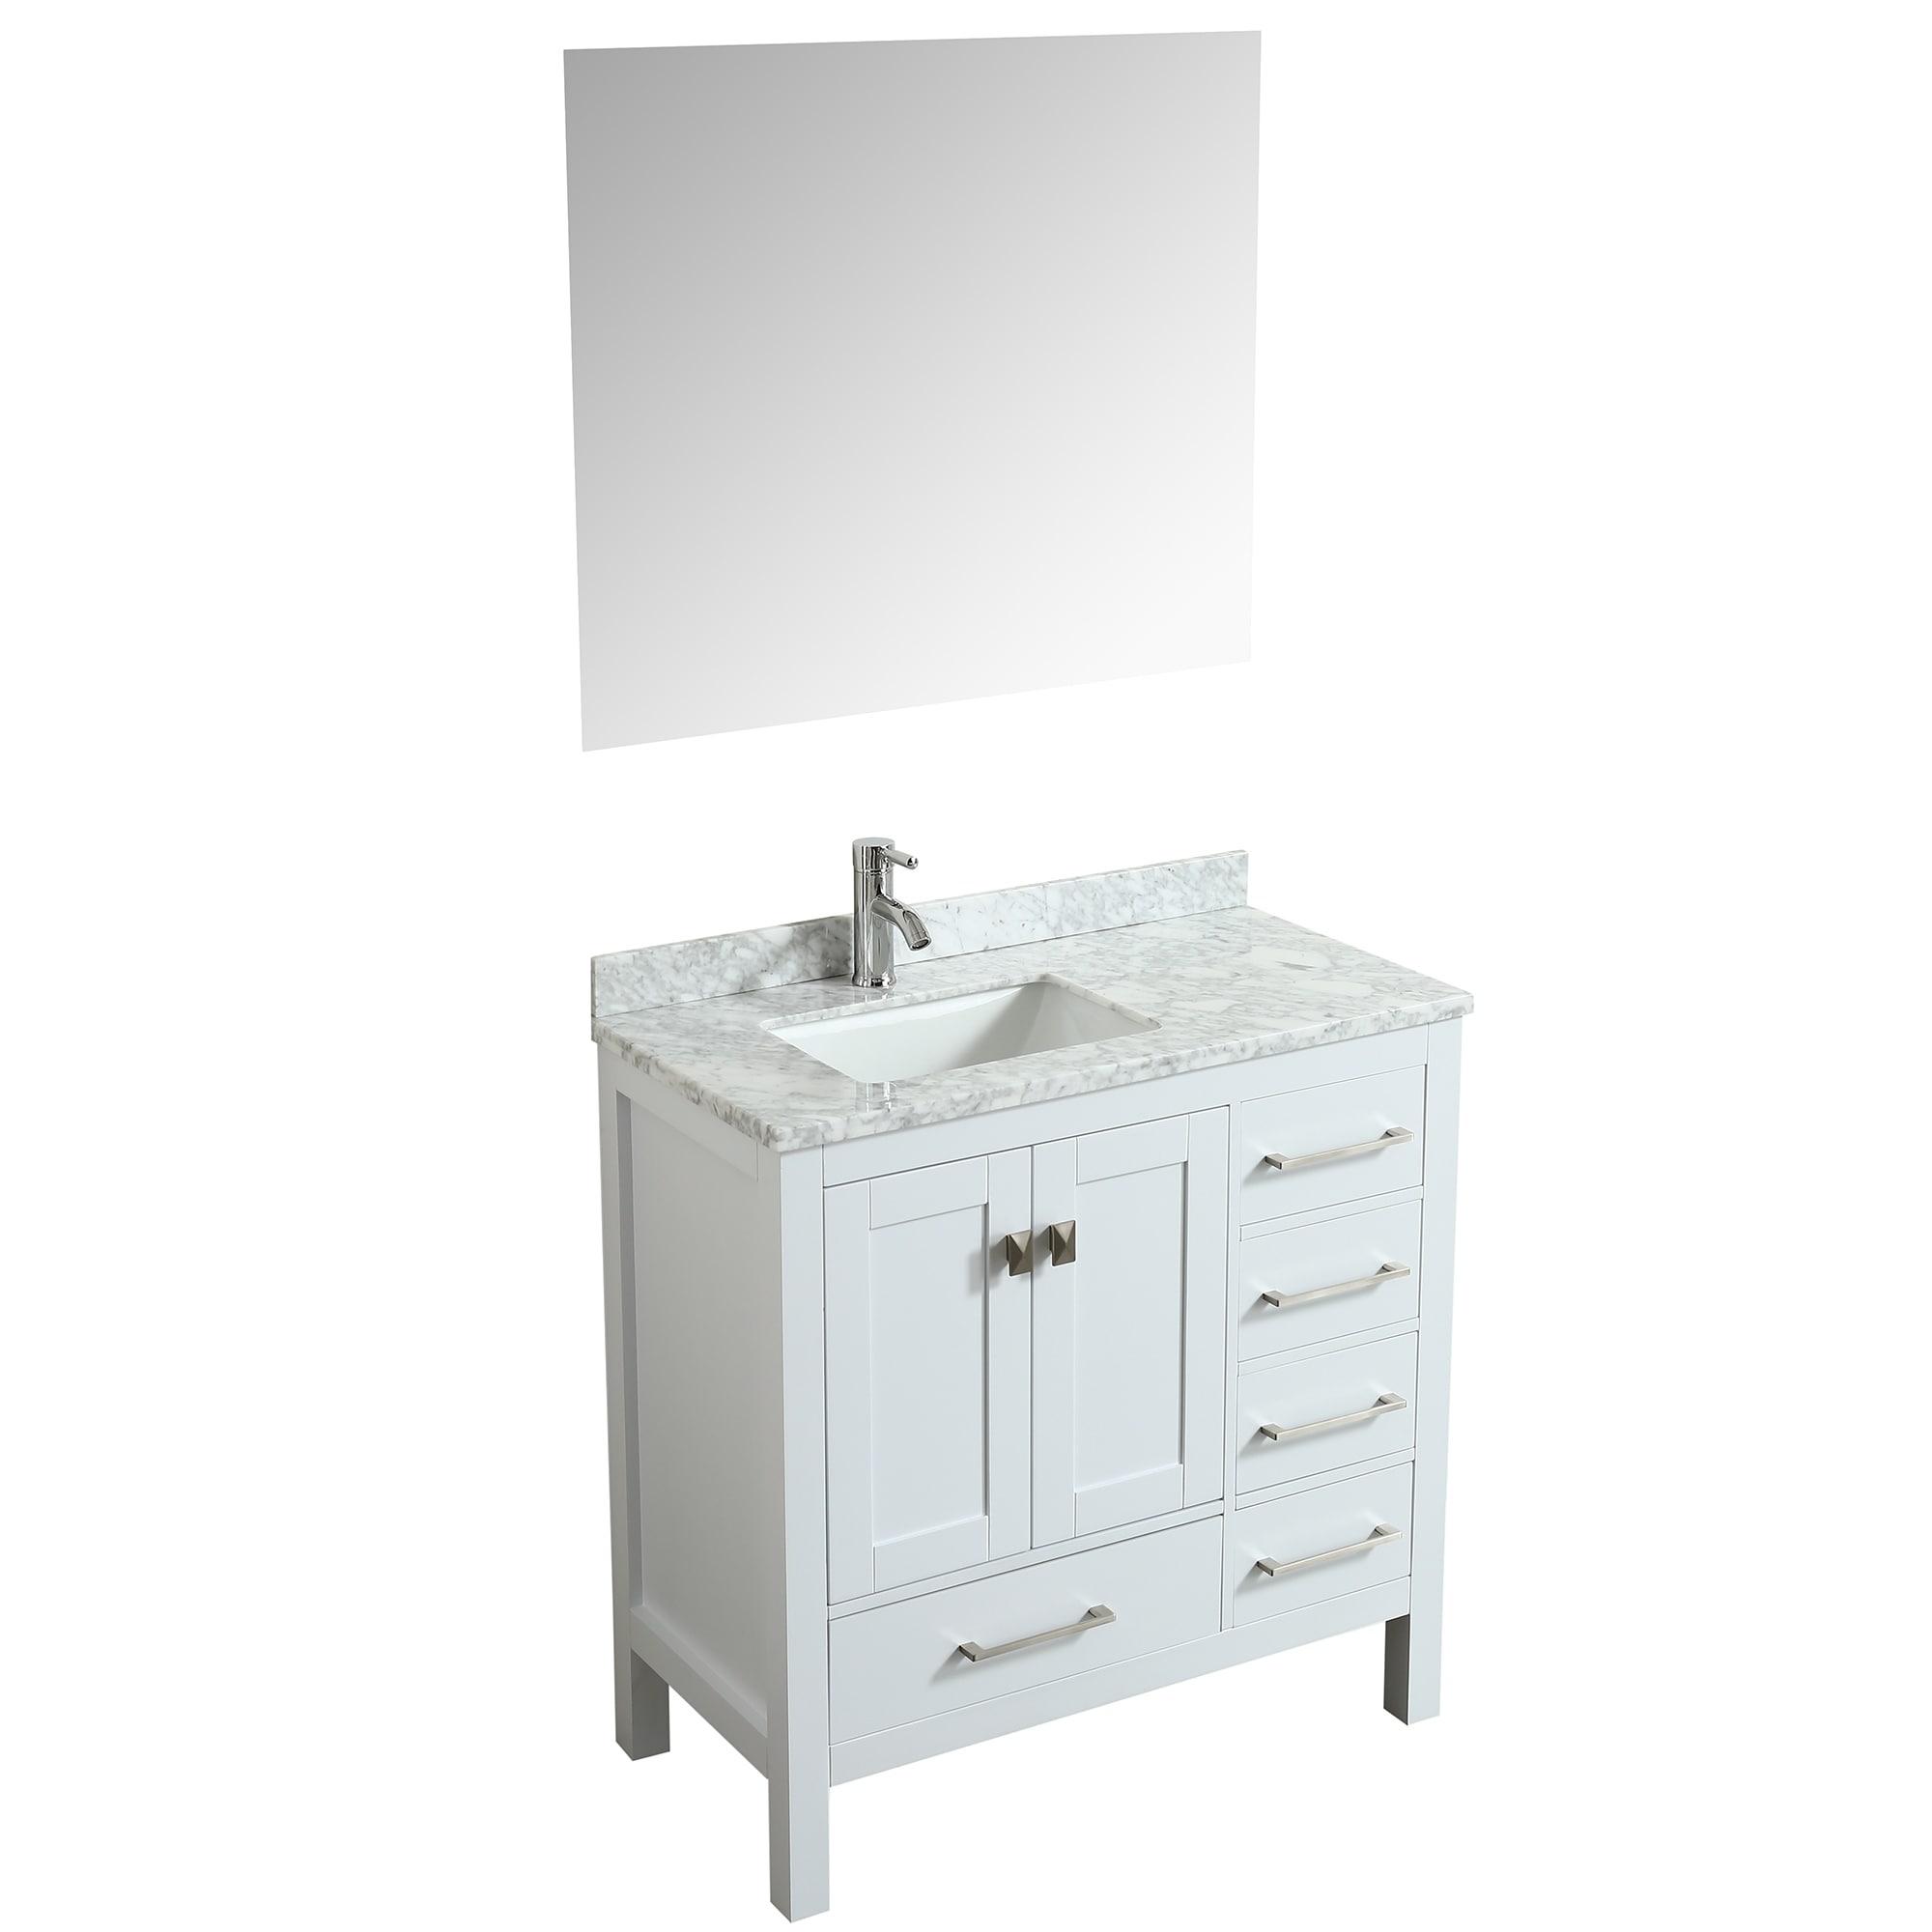 Shop eviva london 36 white bathroom vanity free shipping today overstock com 18269271